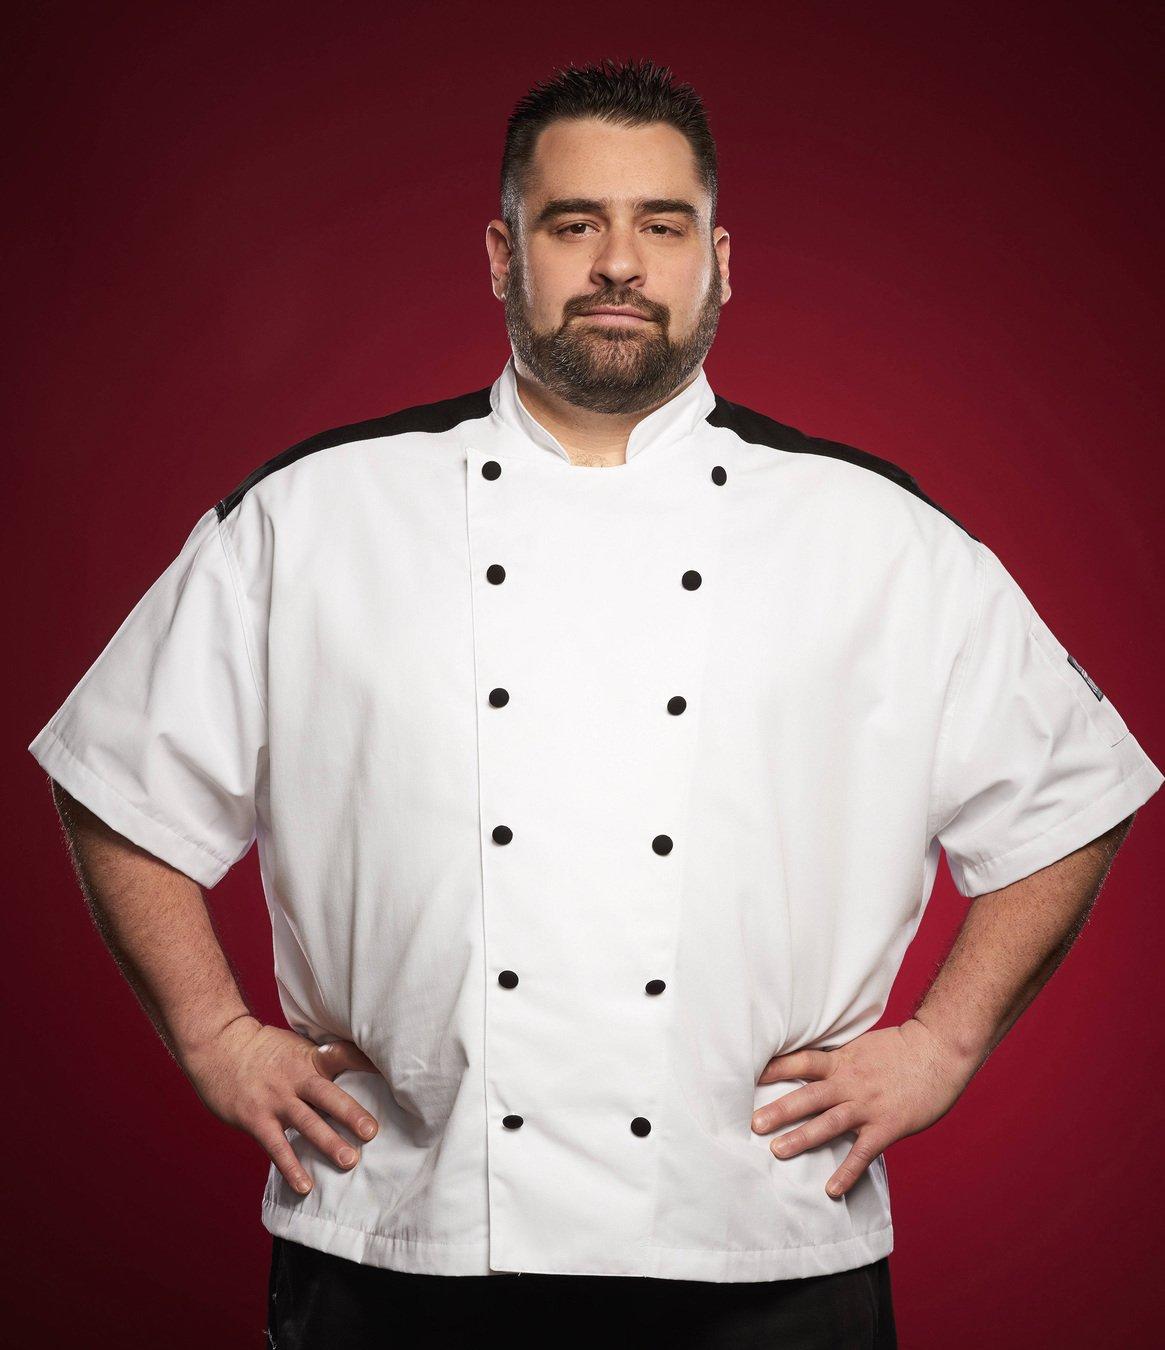 Ben Walanka Hells Kitchen Wiki Fandom